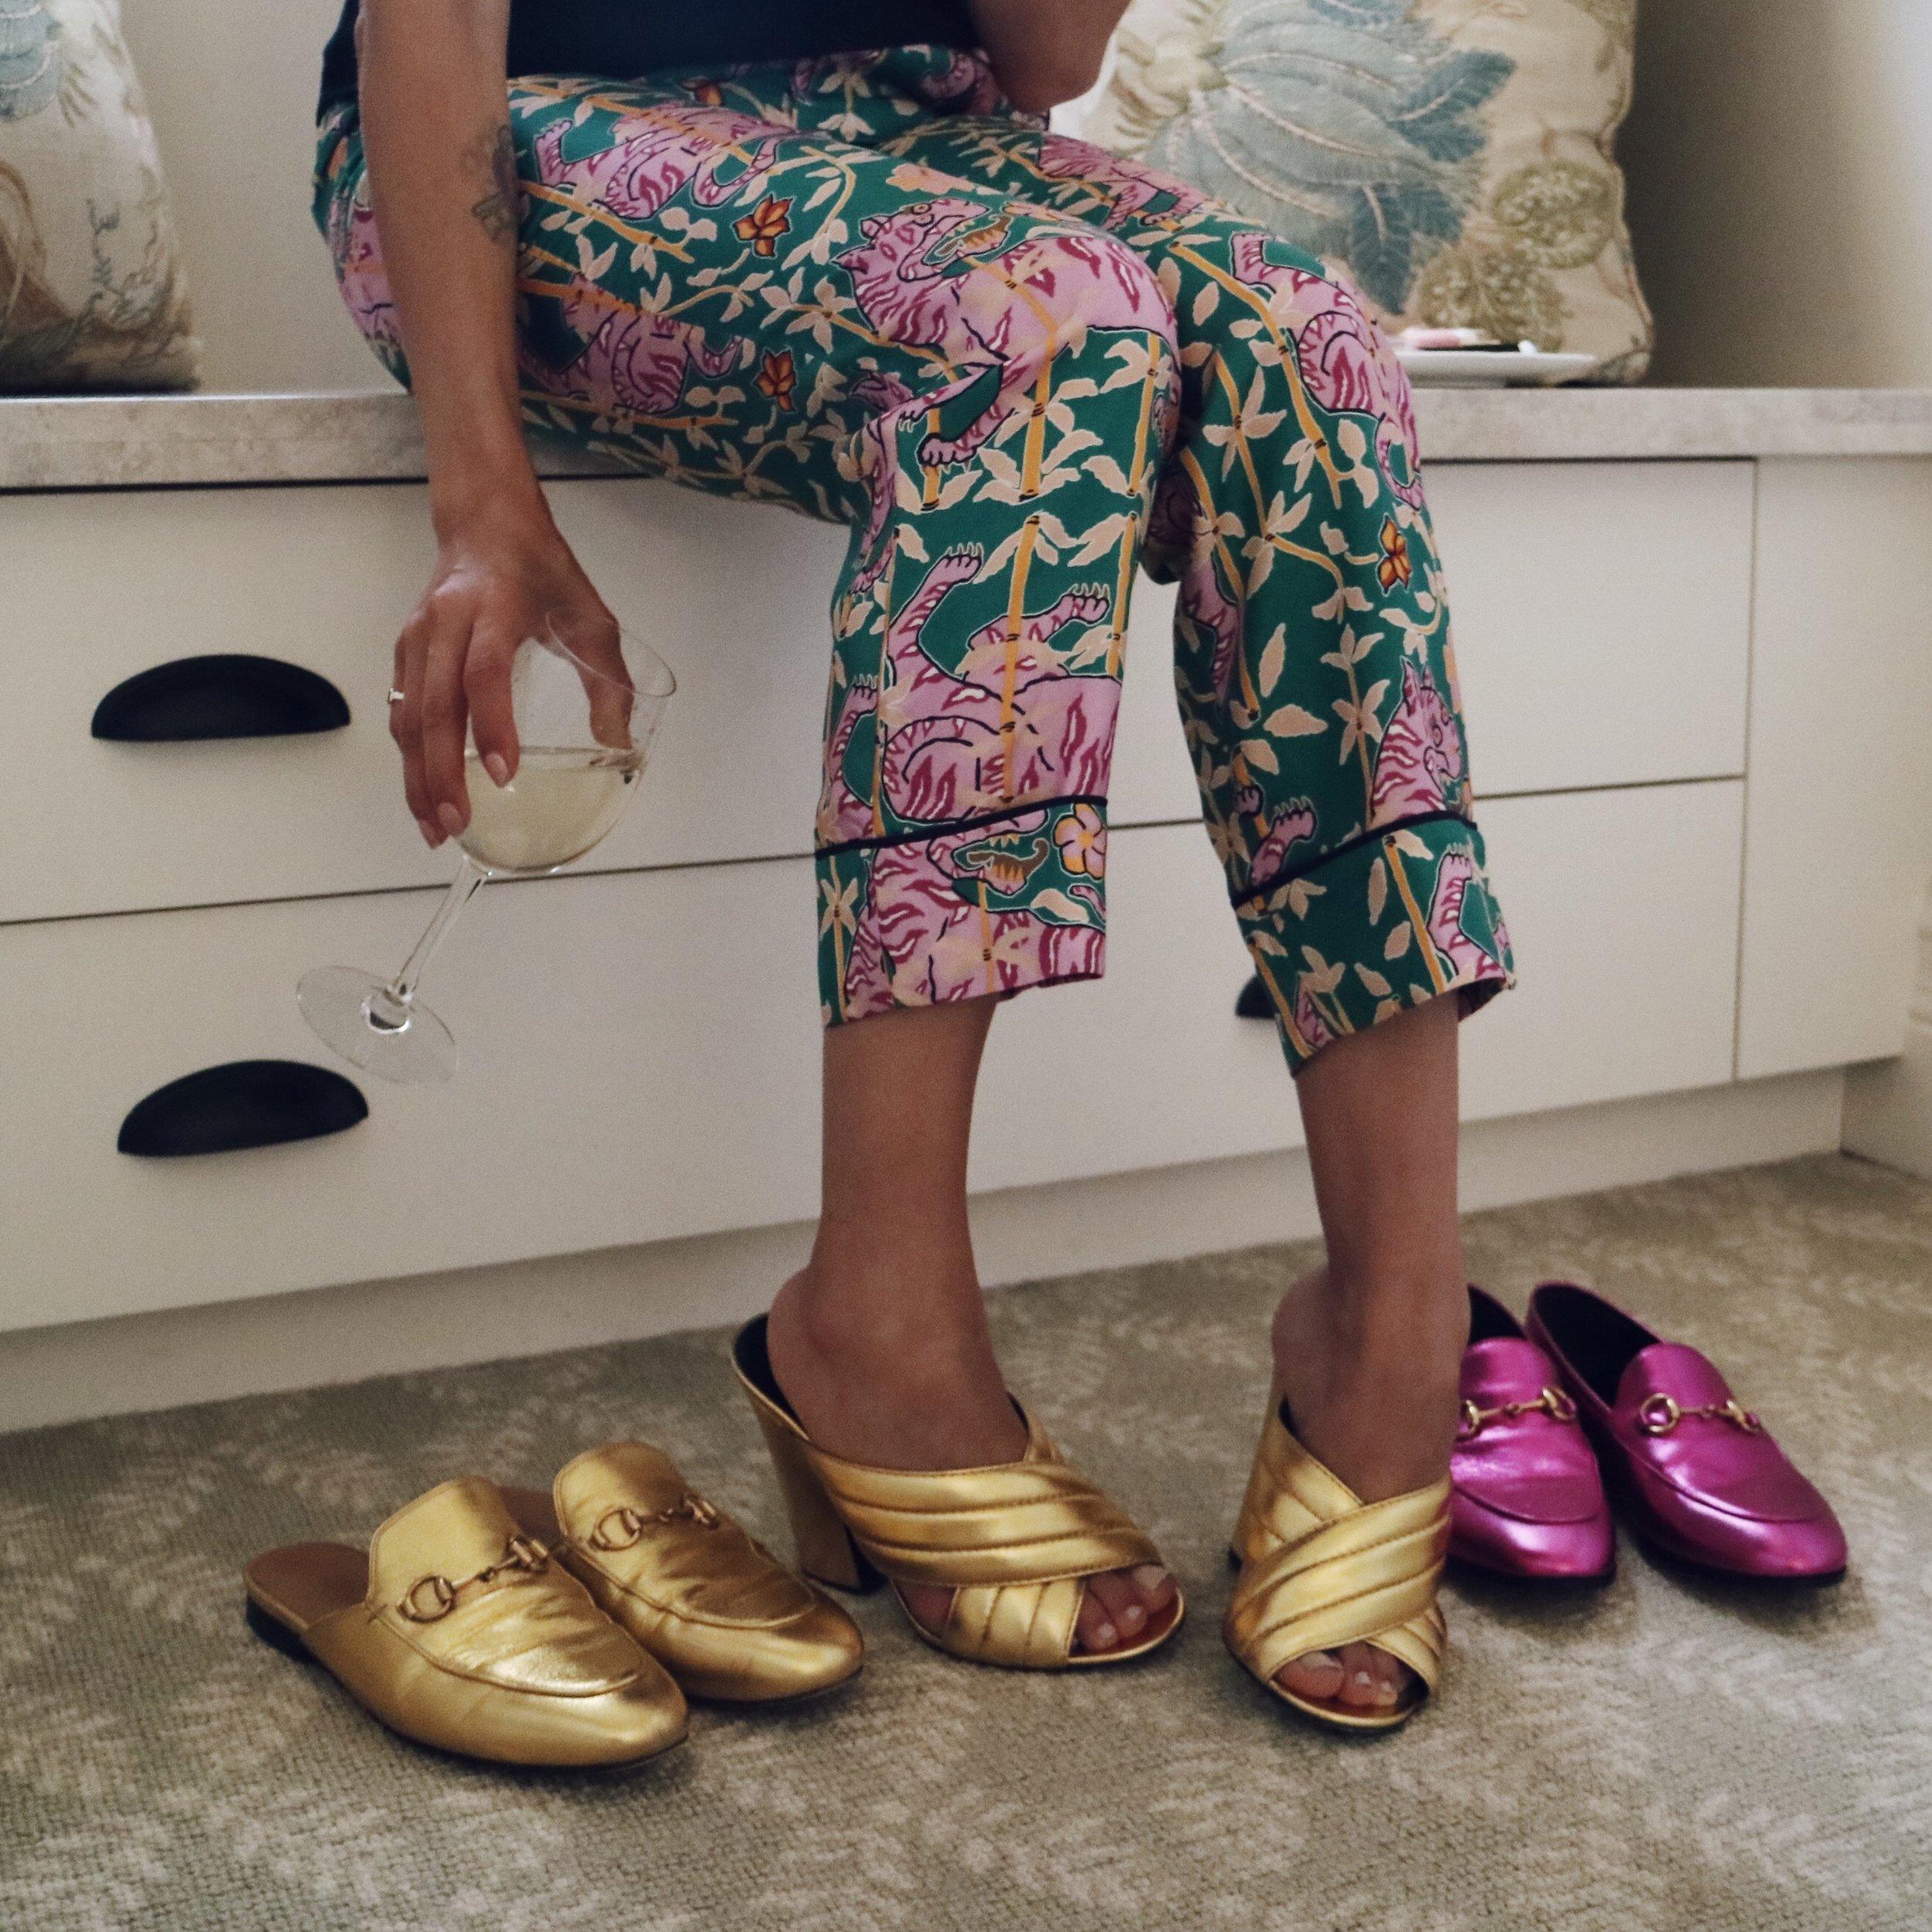 Gucci Shoe Haul and More - WoahStyle.com_0707.JPG